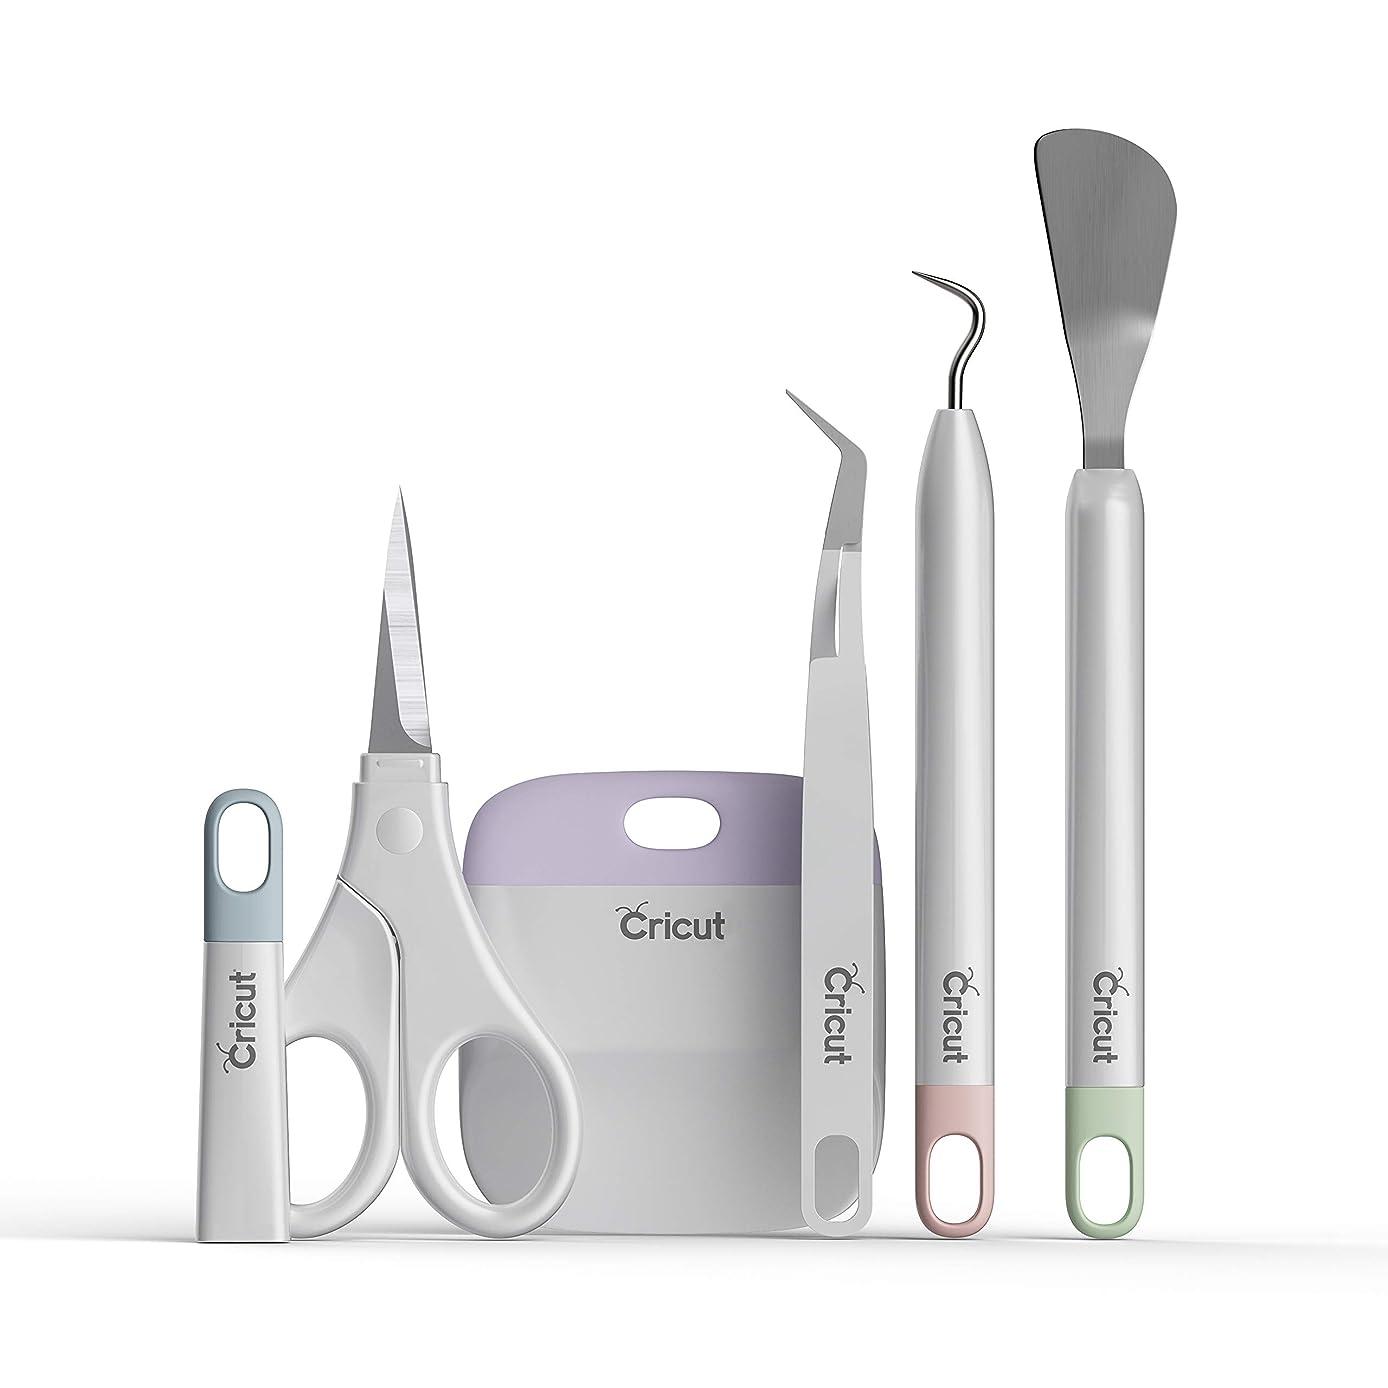 Cricut 2006695 Basic Tool Set, Assorted